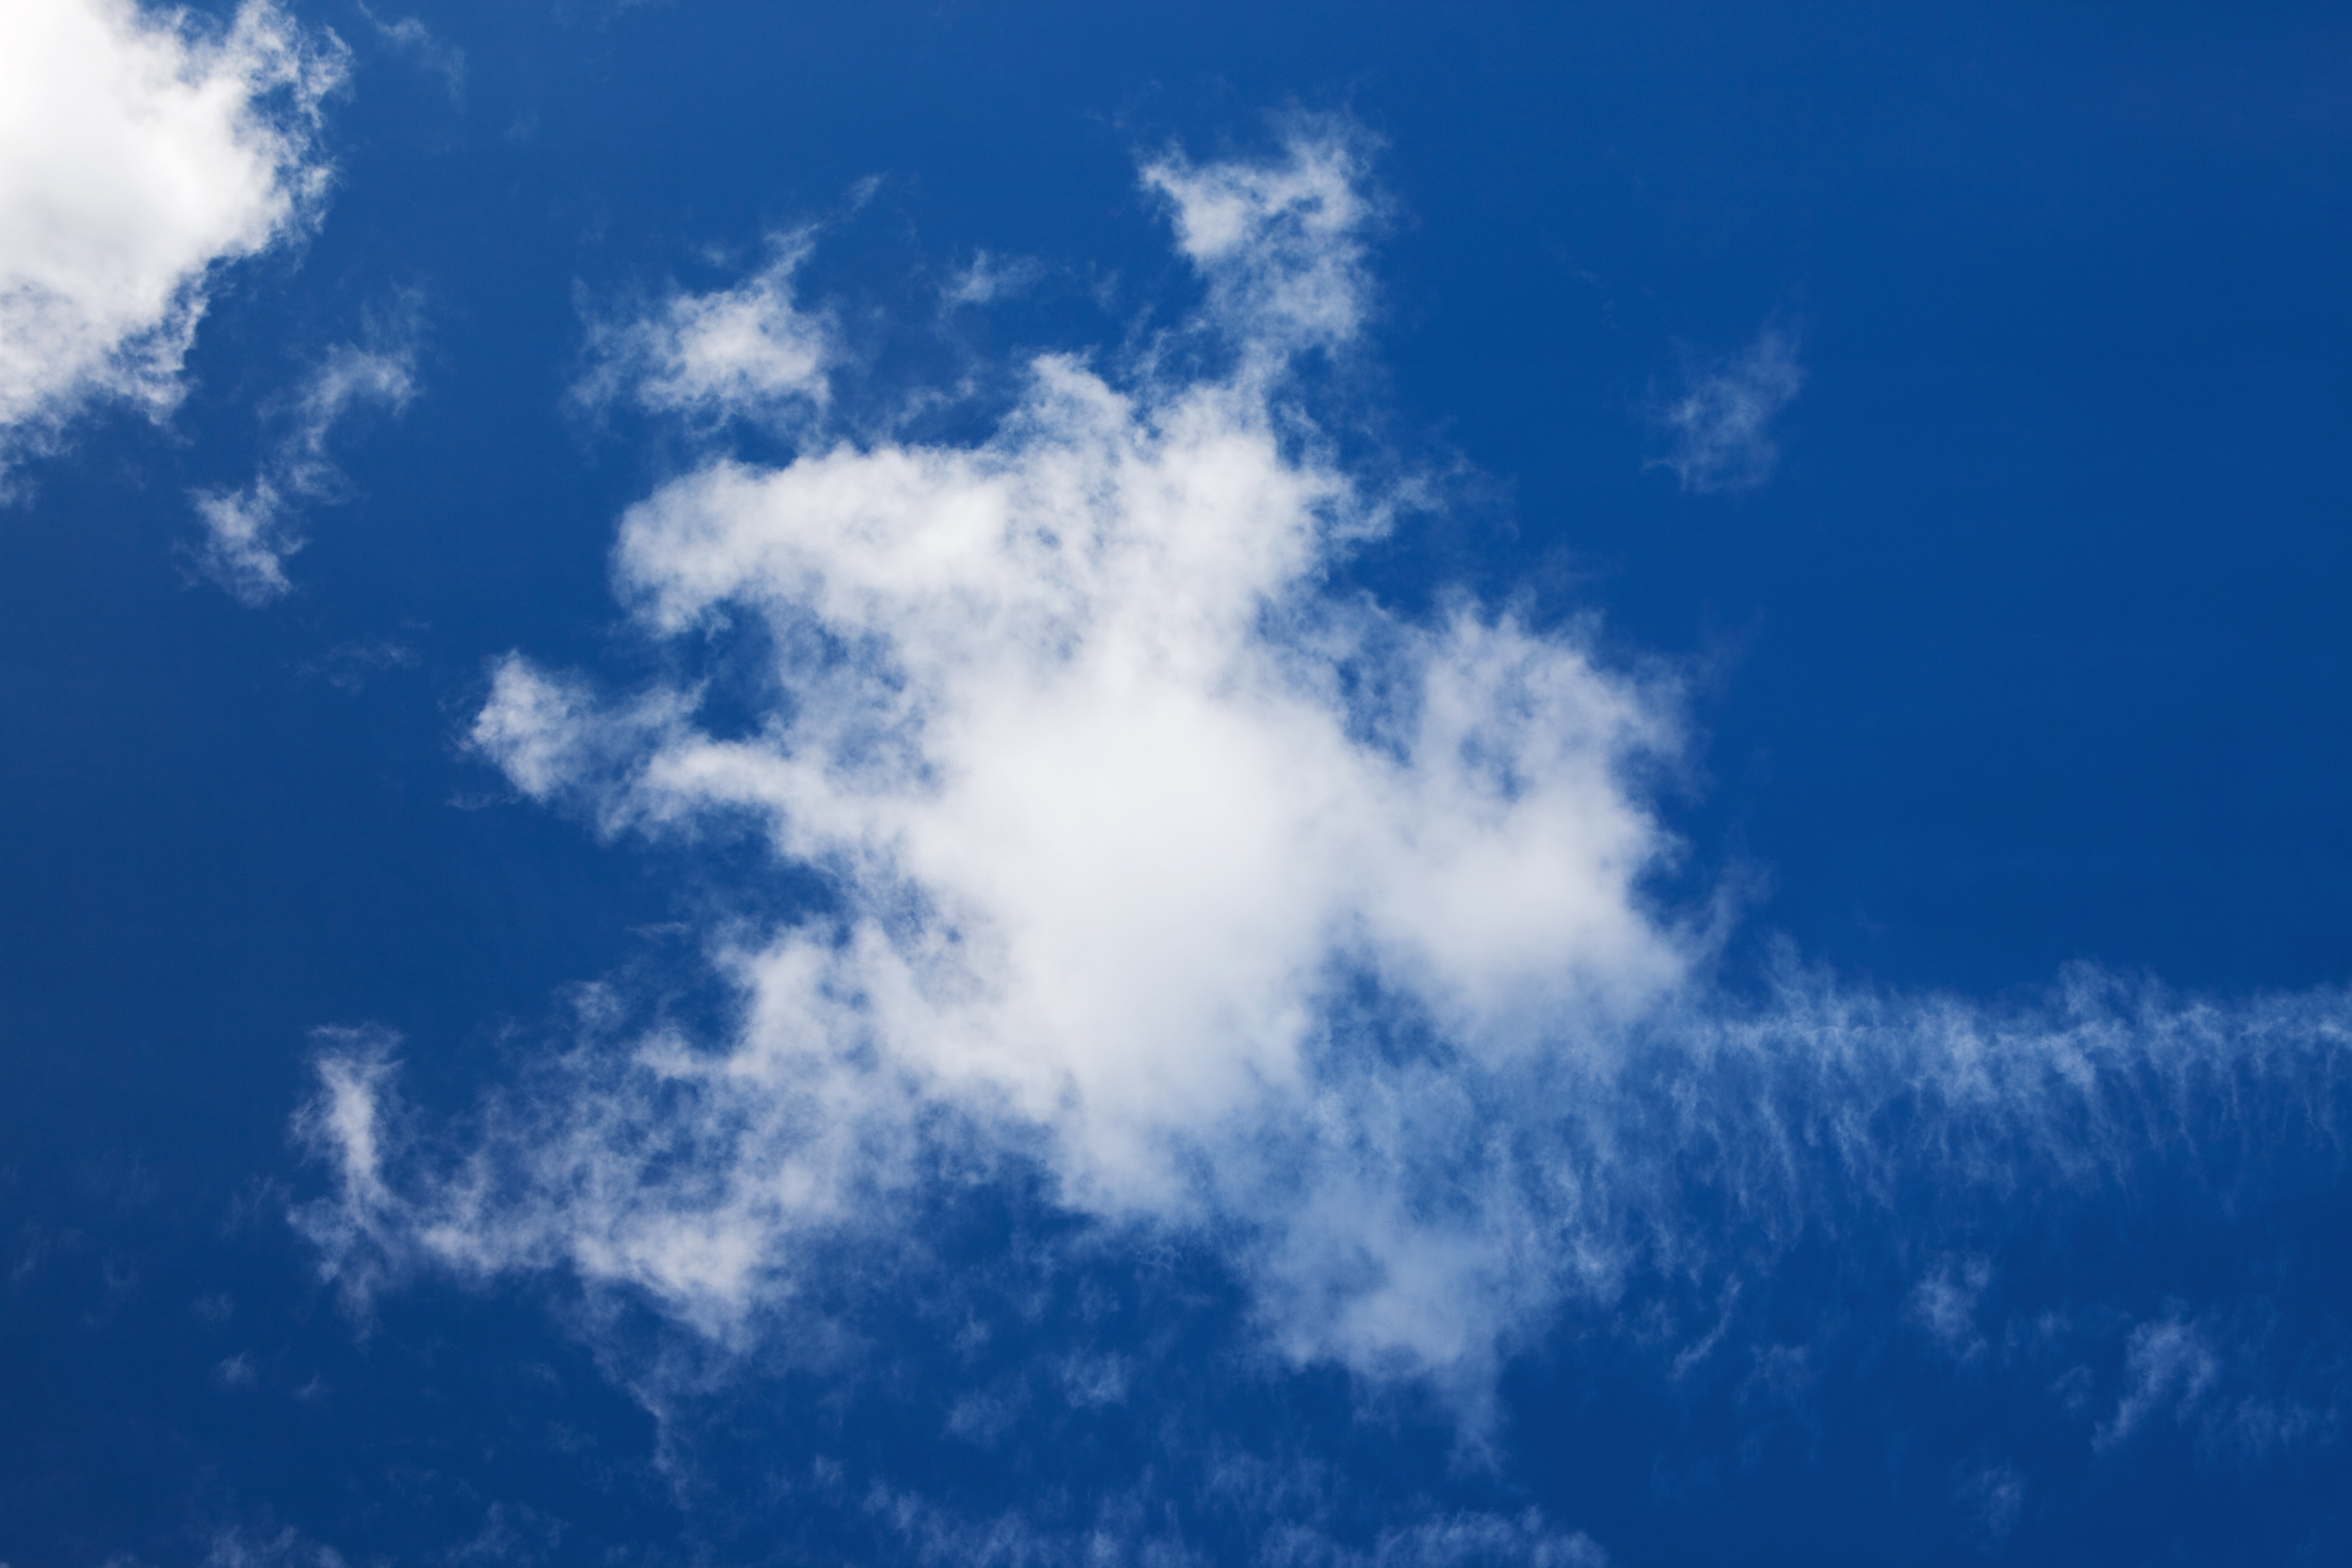 sky, Air, Photo, Meteorology, Moisture, HQ Photo